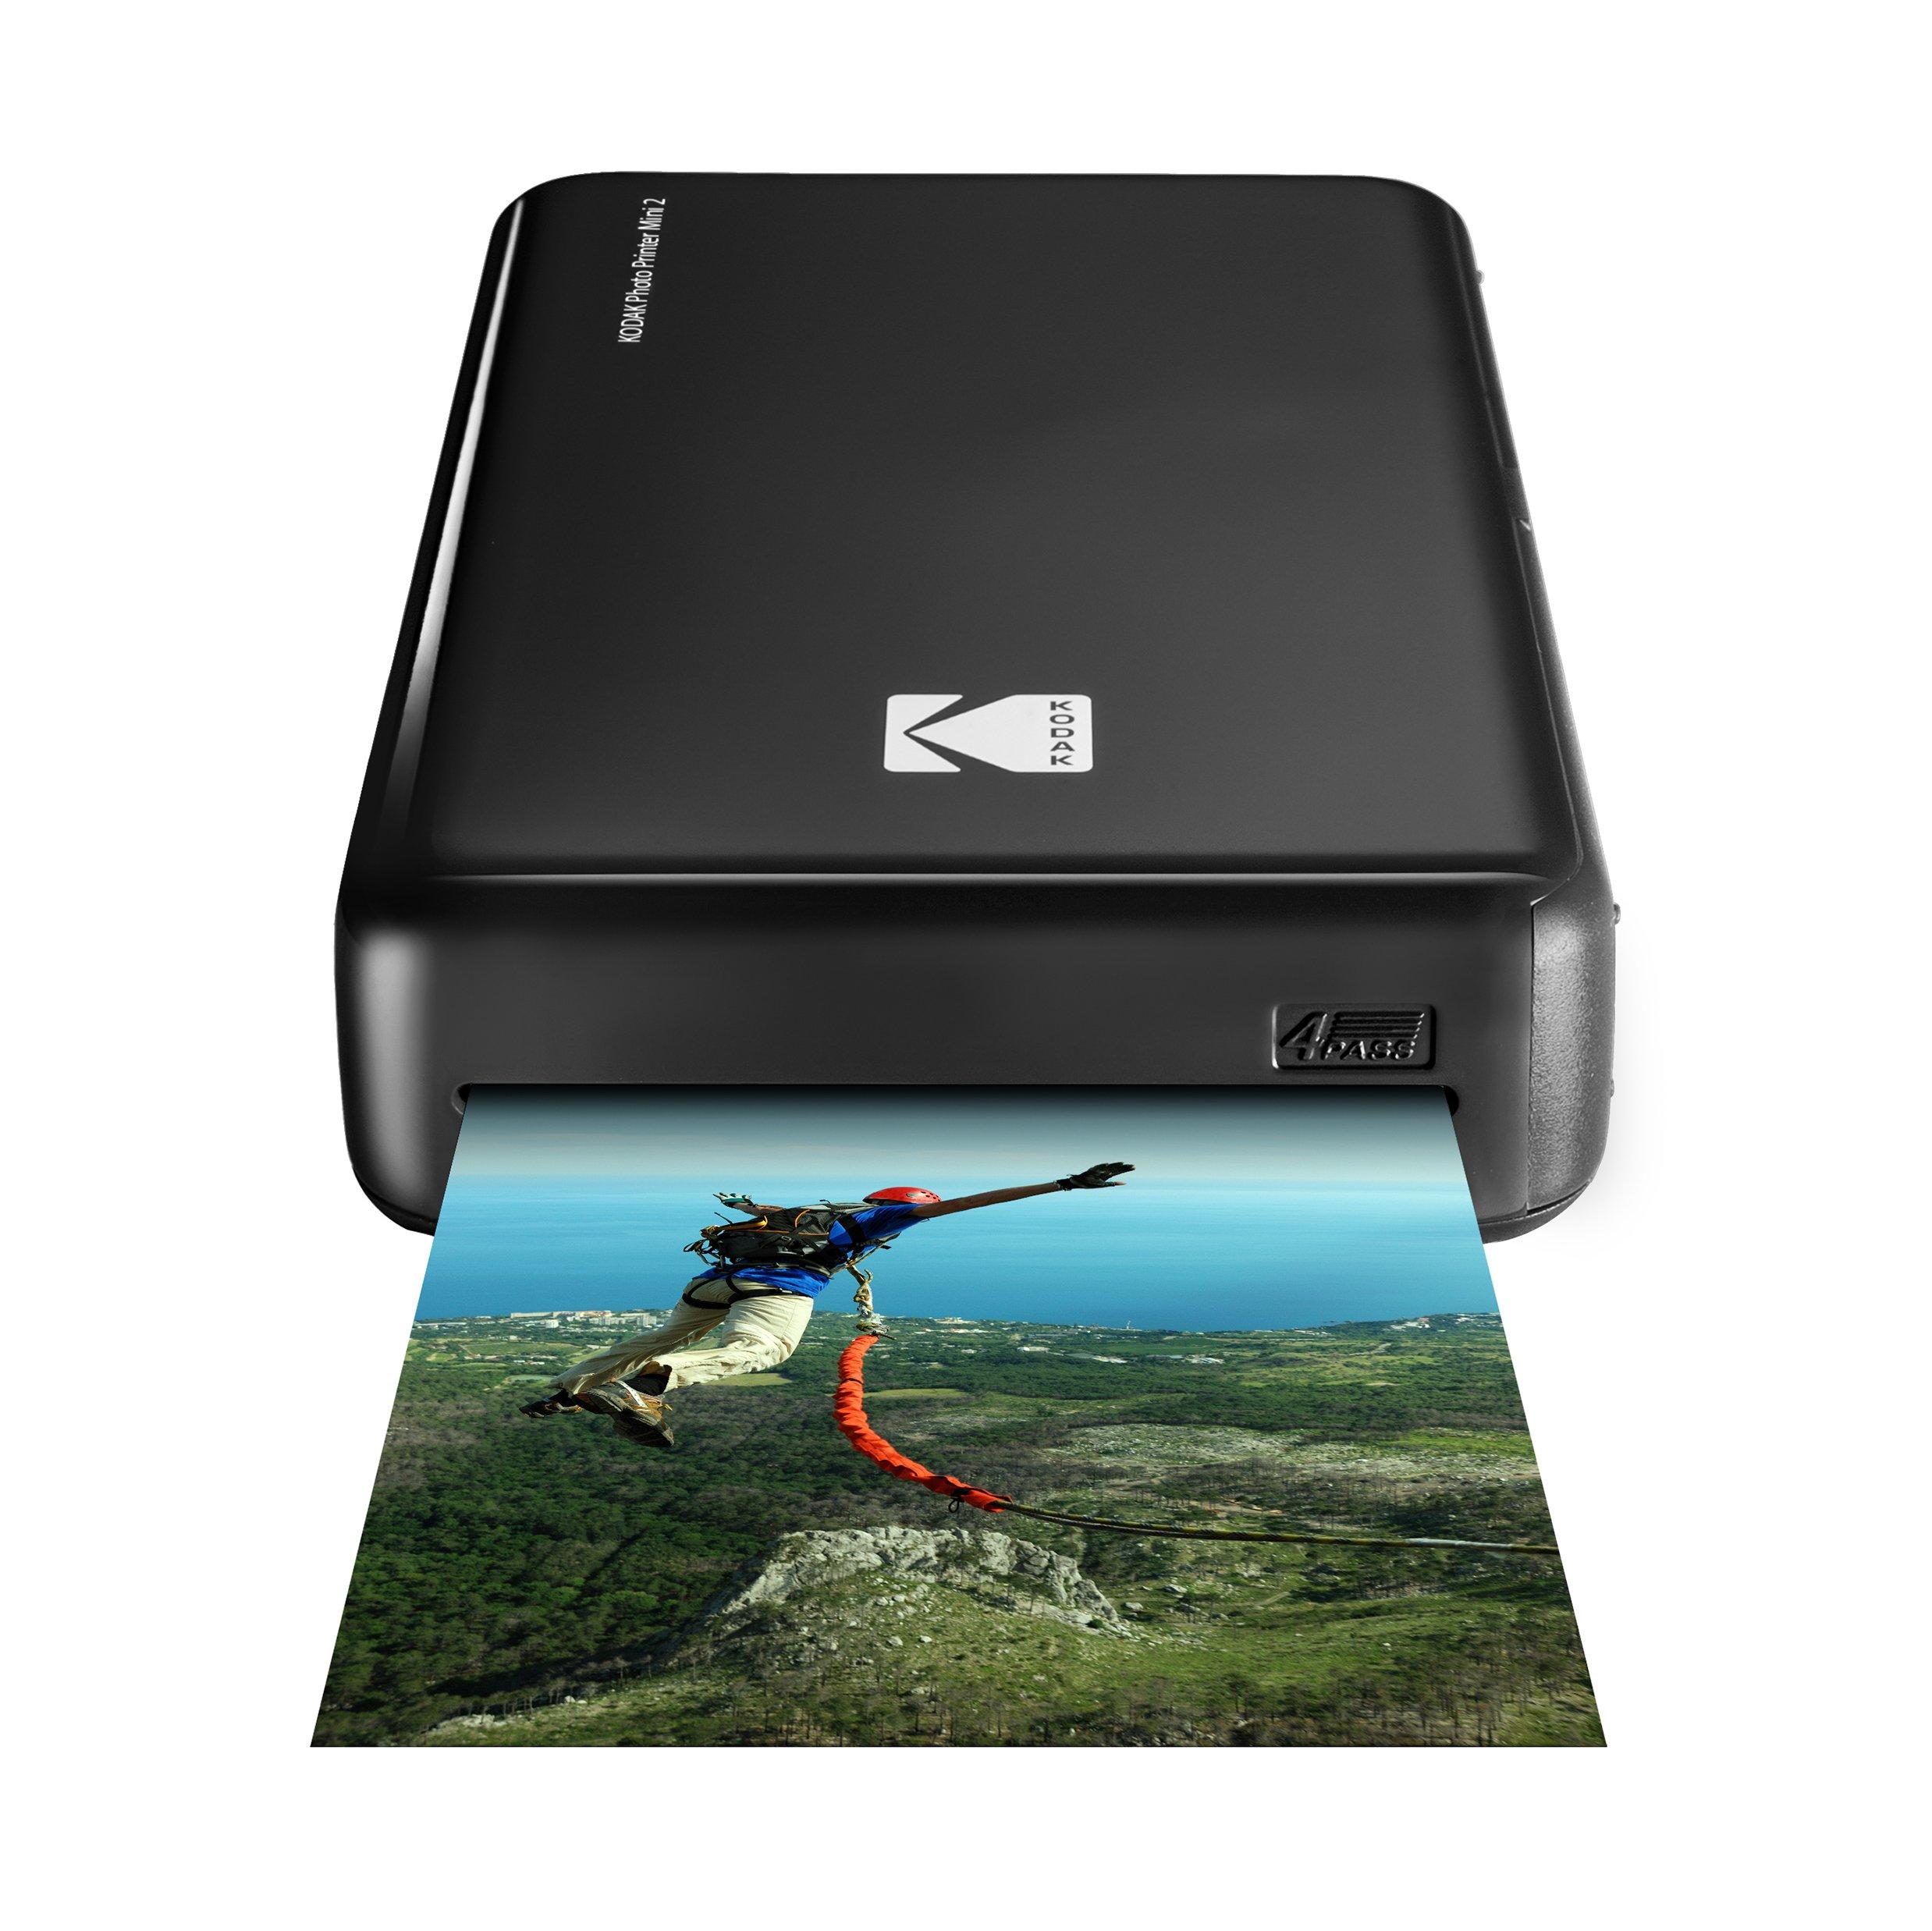 Kodak Mini 2 HD Wireless Portable Mobile Instant Photo Printer, Print Social Media Photos, Premium Quality Full Color Prints – Compatible w/iOS & Android Devices (Black)